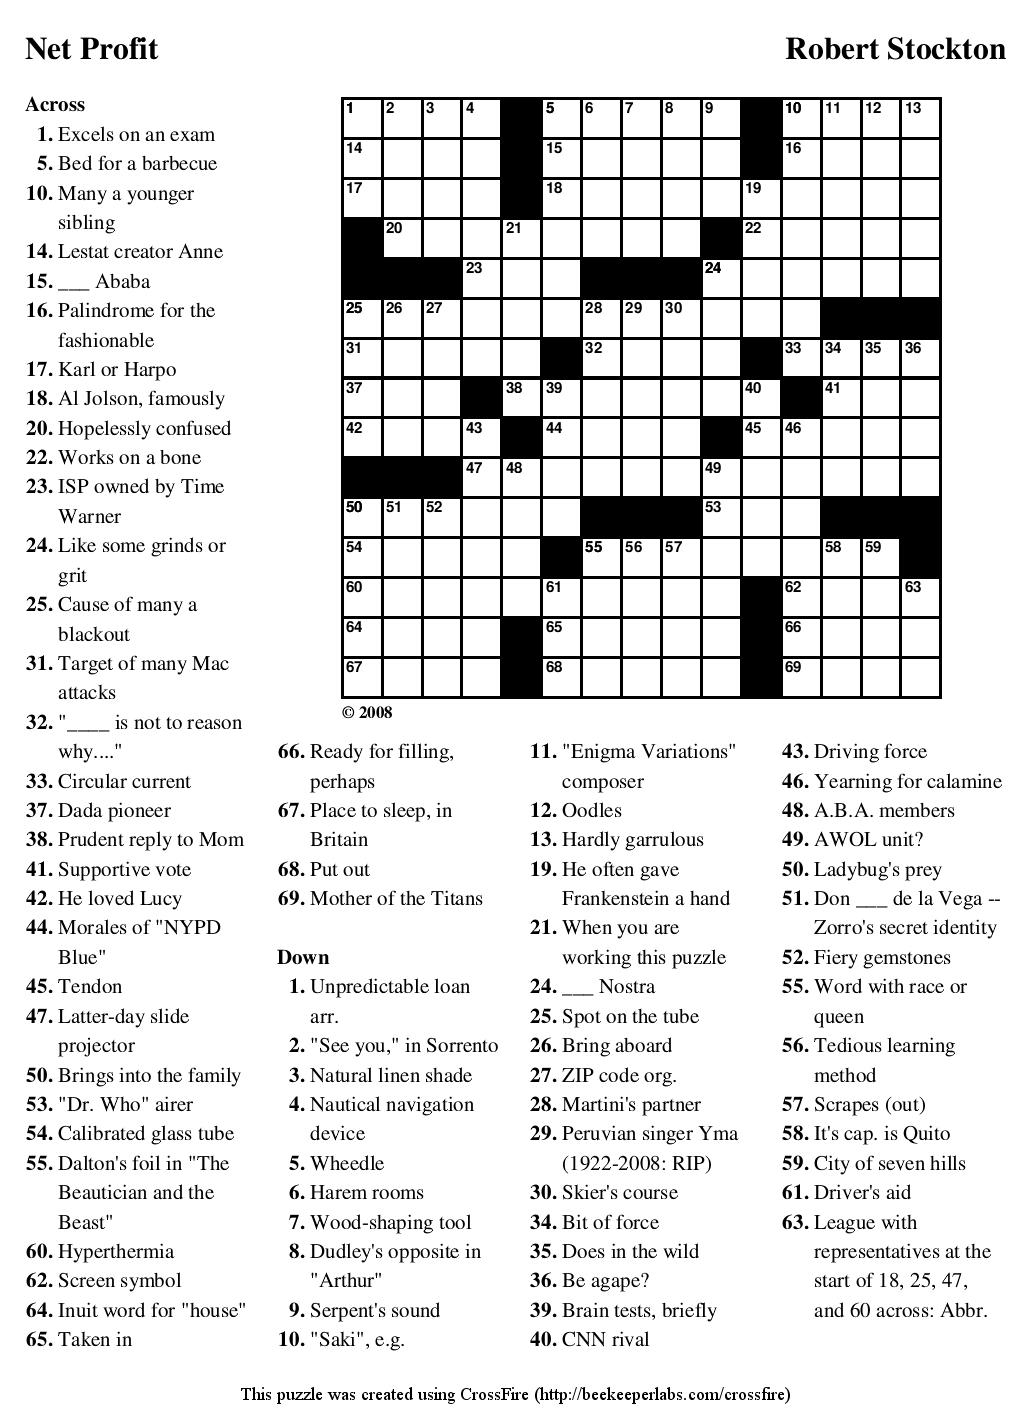 Netprofit Large Crosswords Printable Crossword Puzzle - Printable Picture Puzzles